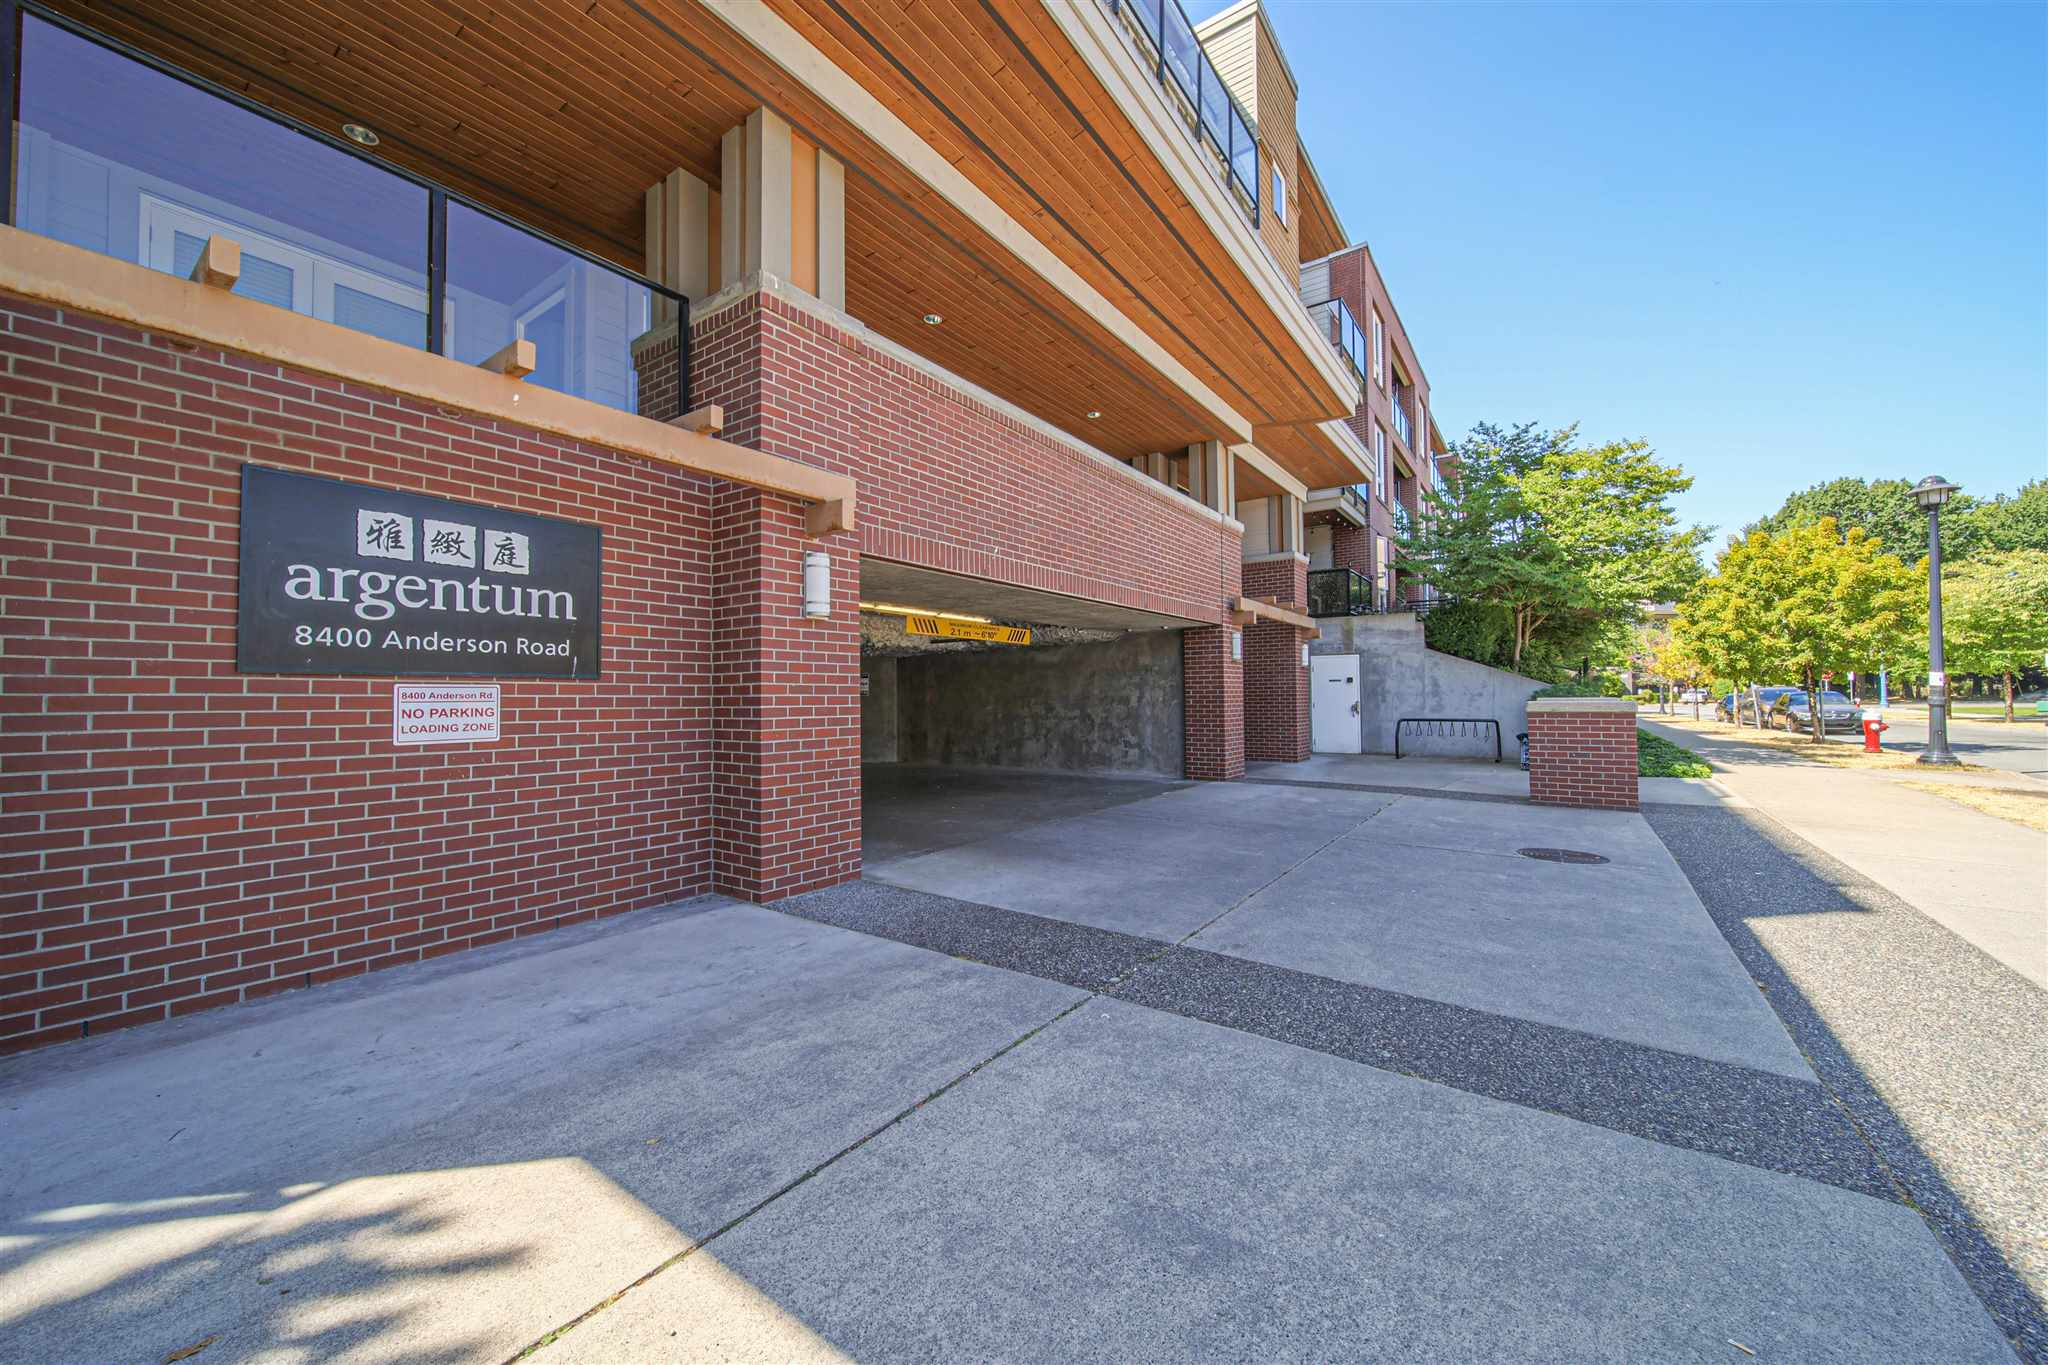 208 8400 ANDERSON ROAD - Brighouse Apartment/Condo for sale, 2 Bedrooms (R2606137) - #1